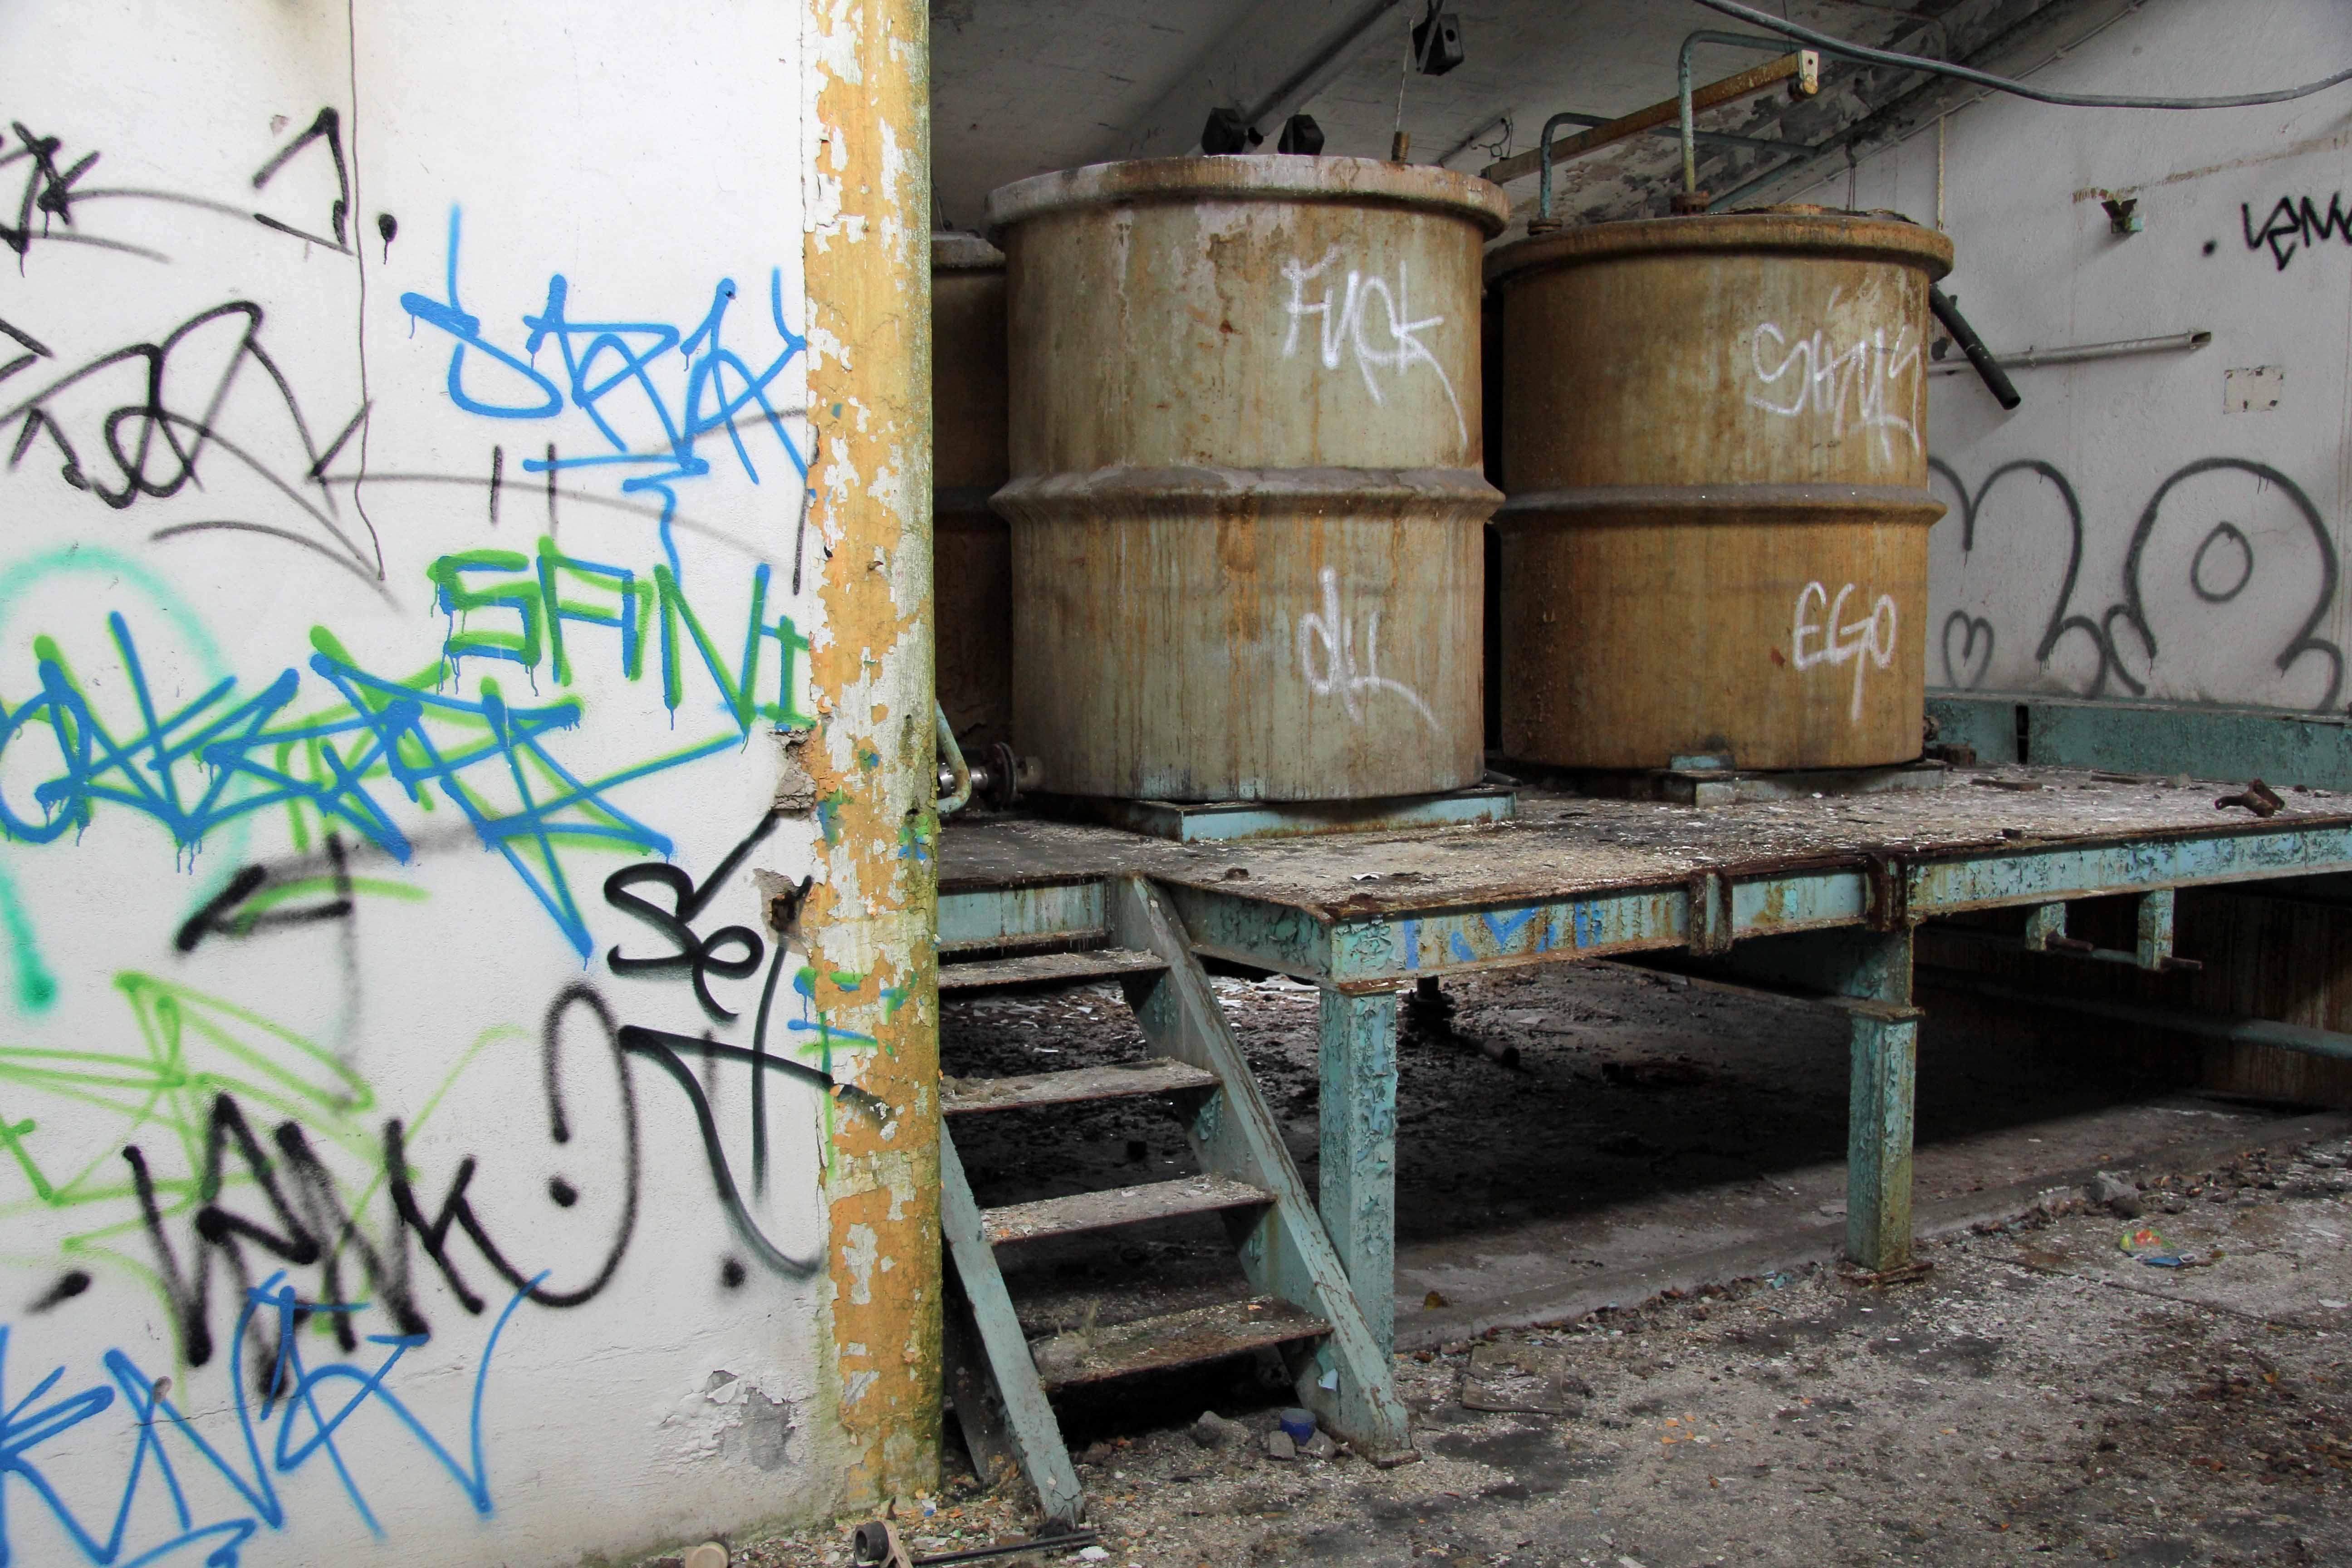 Vats at Papierfabrik Wolfswinkel, an abandoned paper mill near Berlin